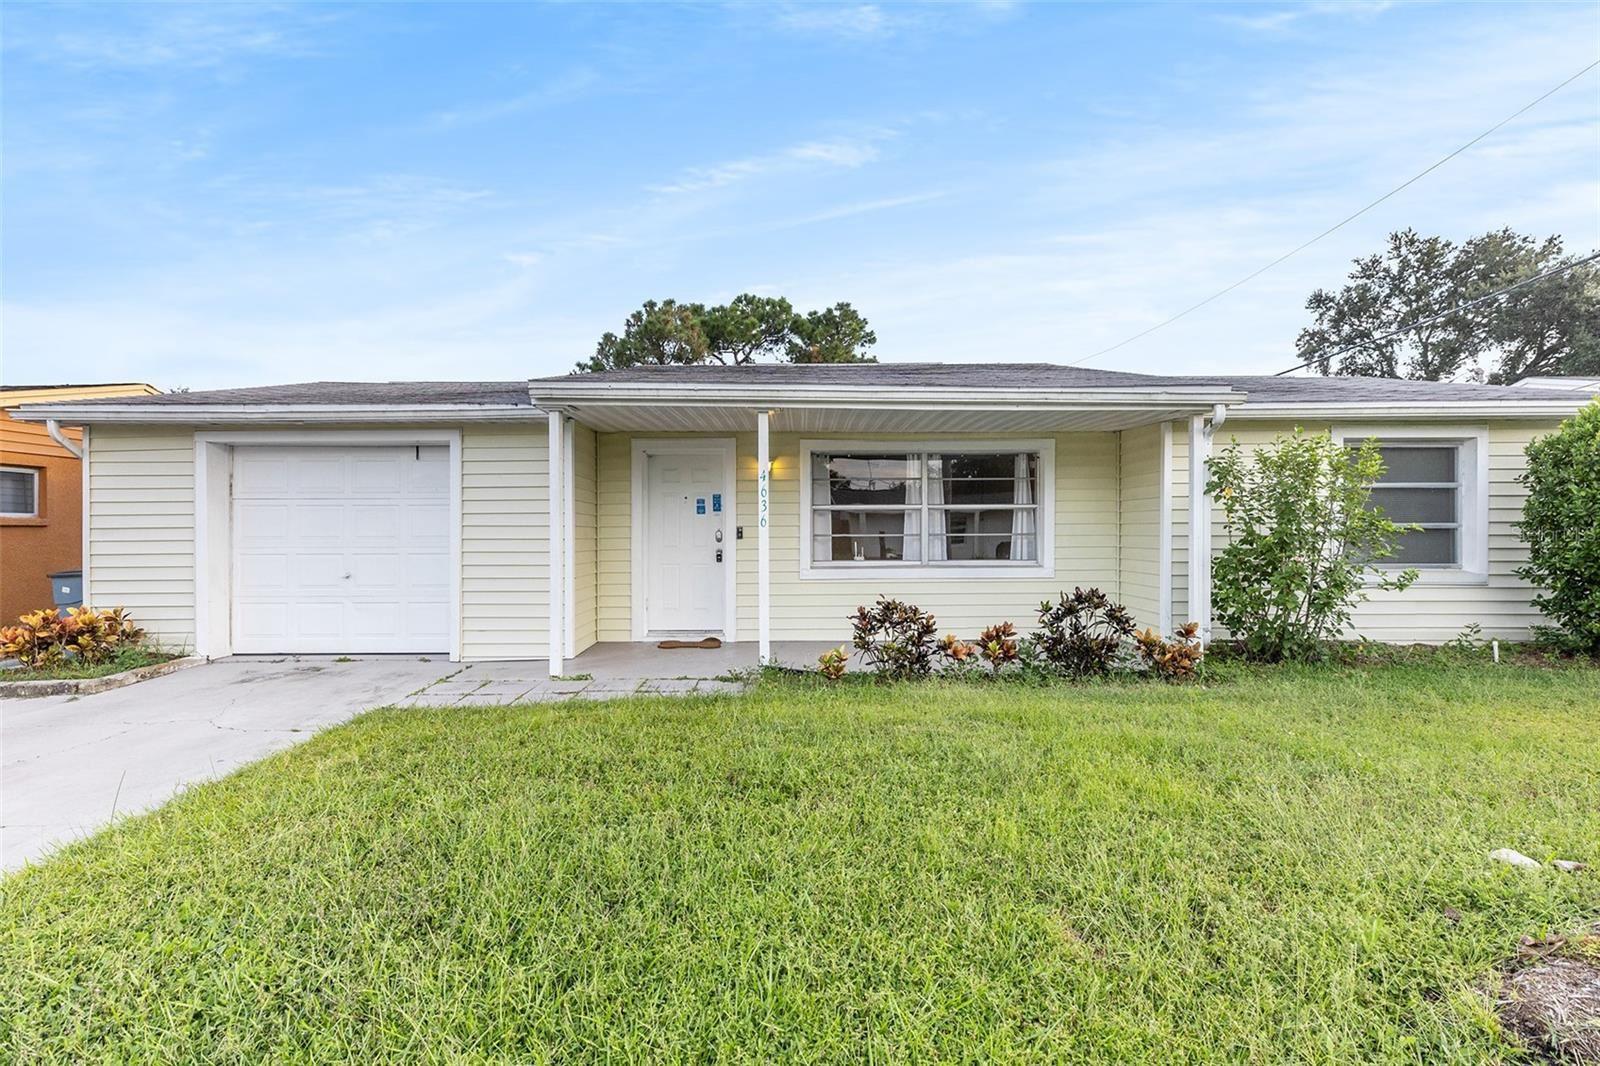 4636 EASTWOOD LANE, Holiday, FL 34690 - MLS#: O5976445